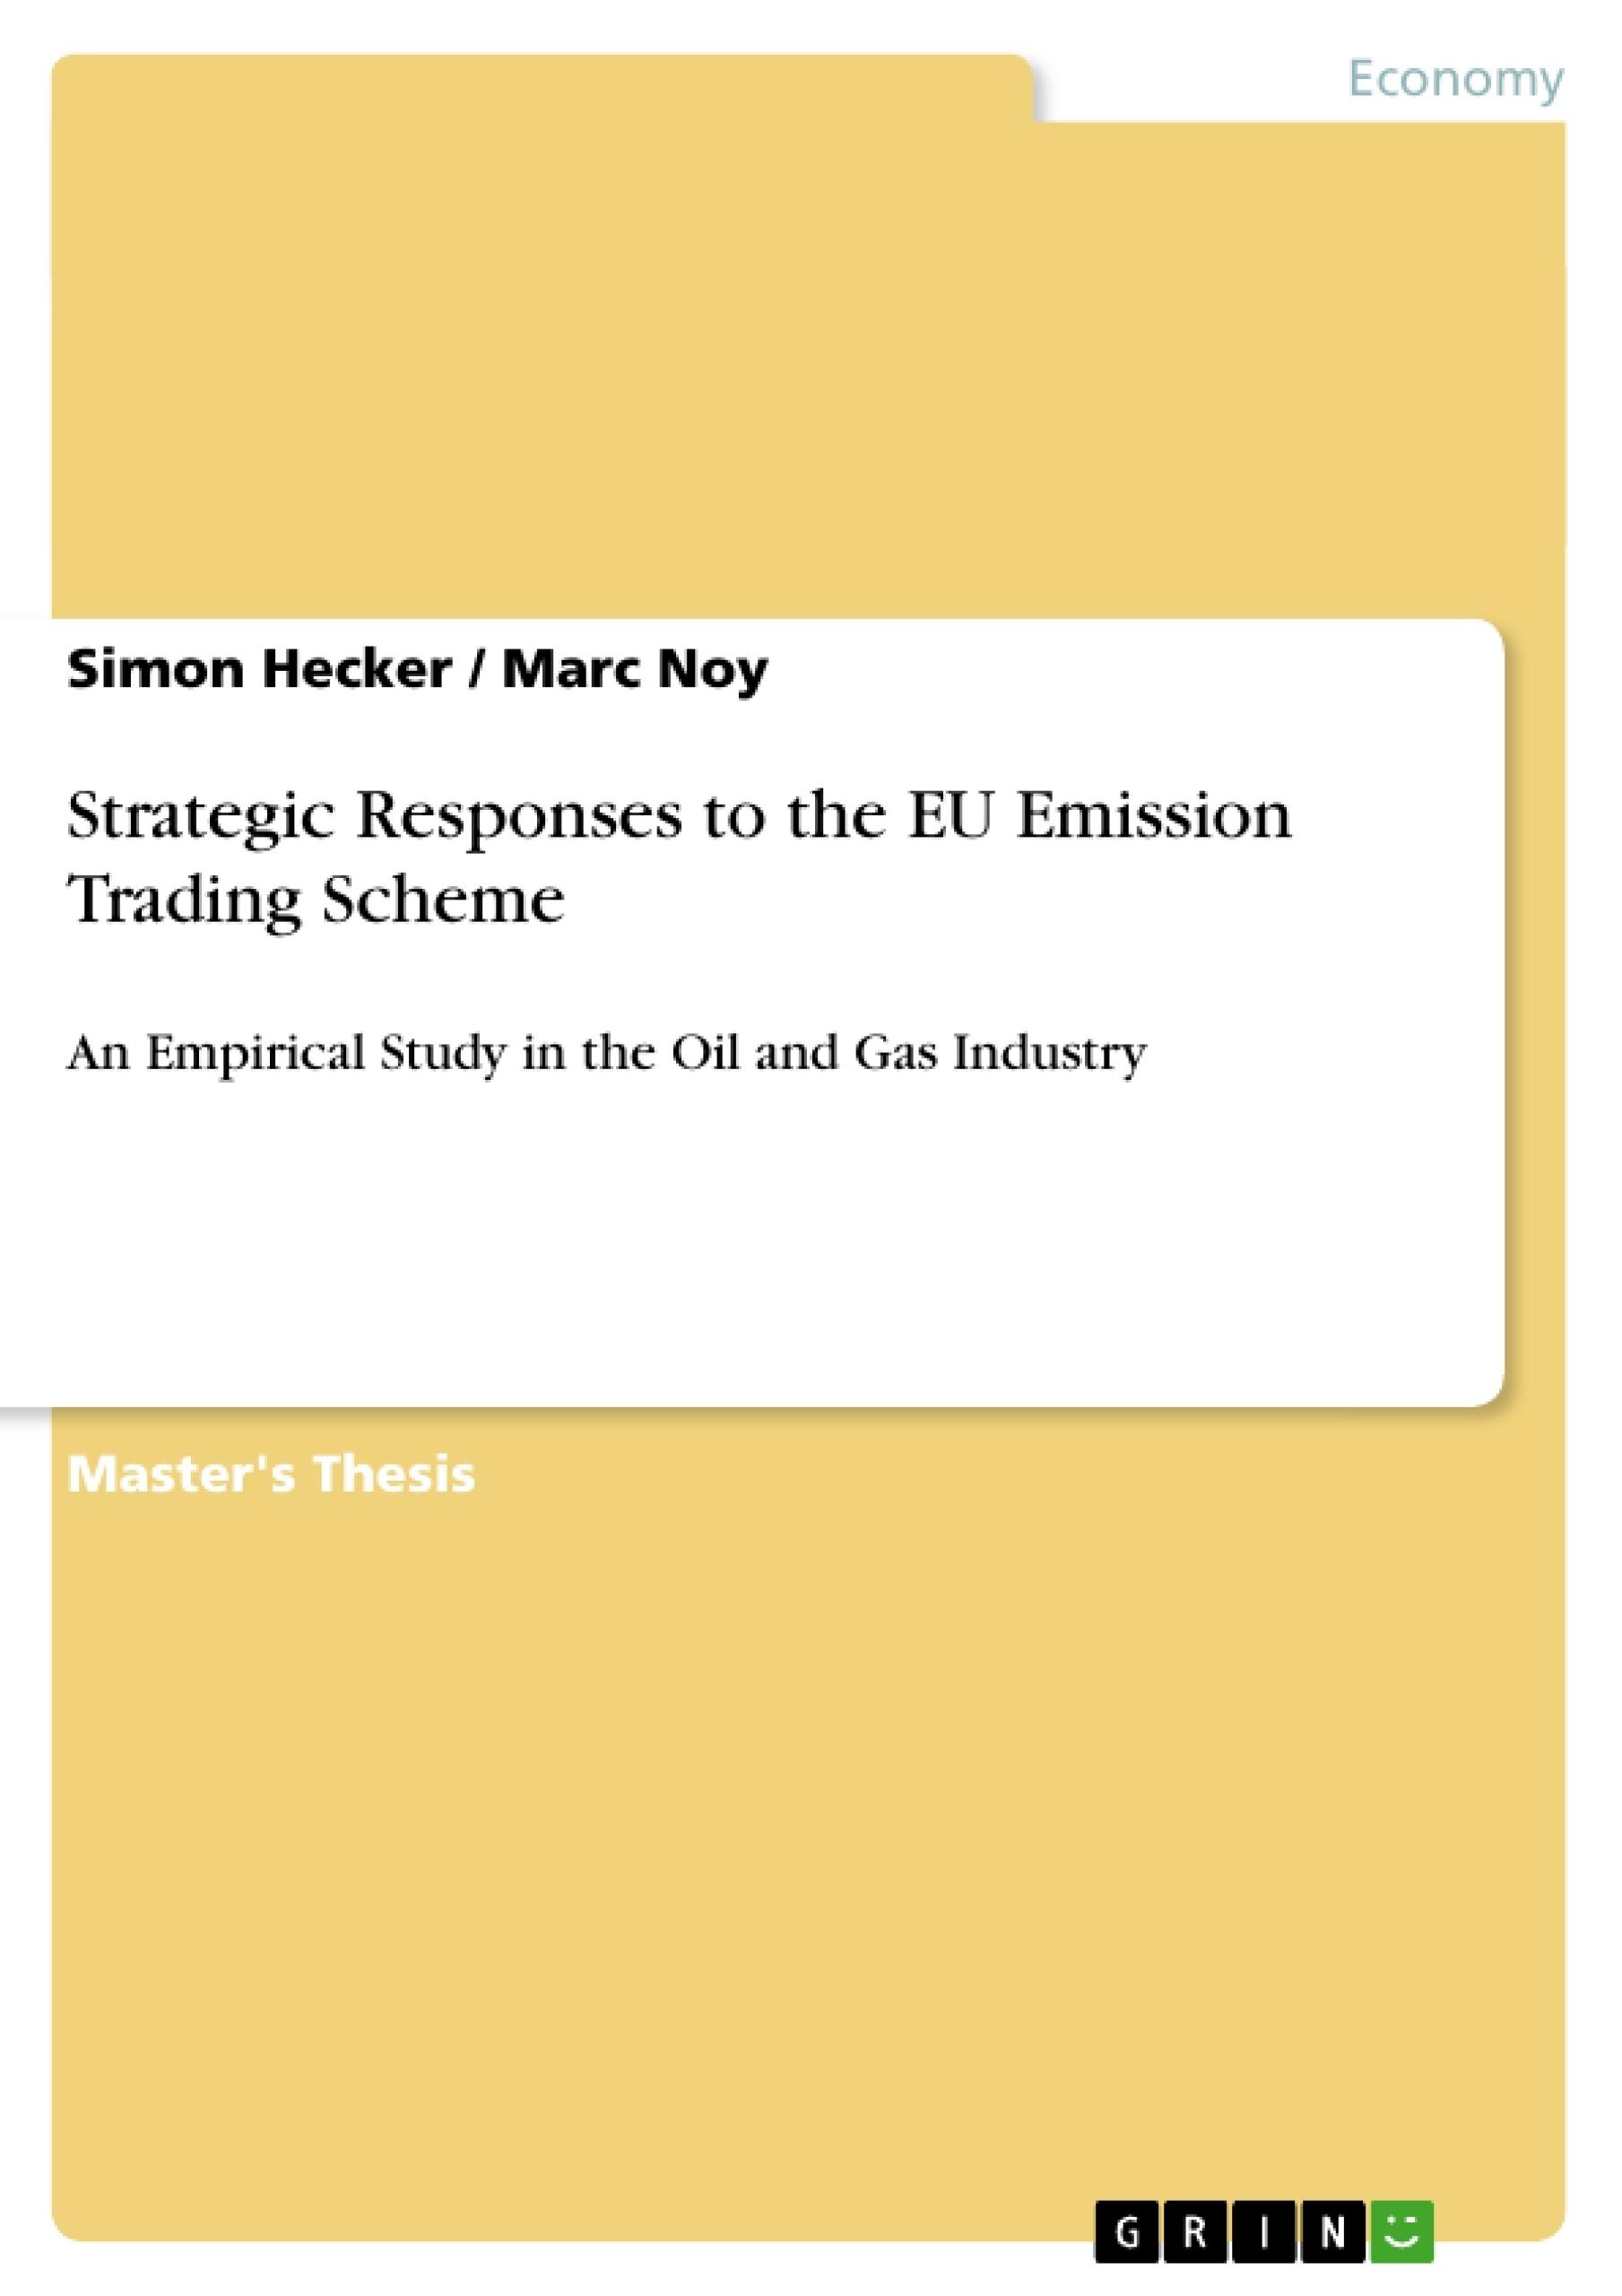 Title: Strategic Responses to the EU Emission Trading Scheme